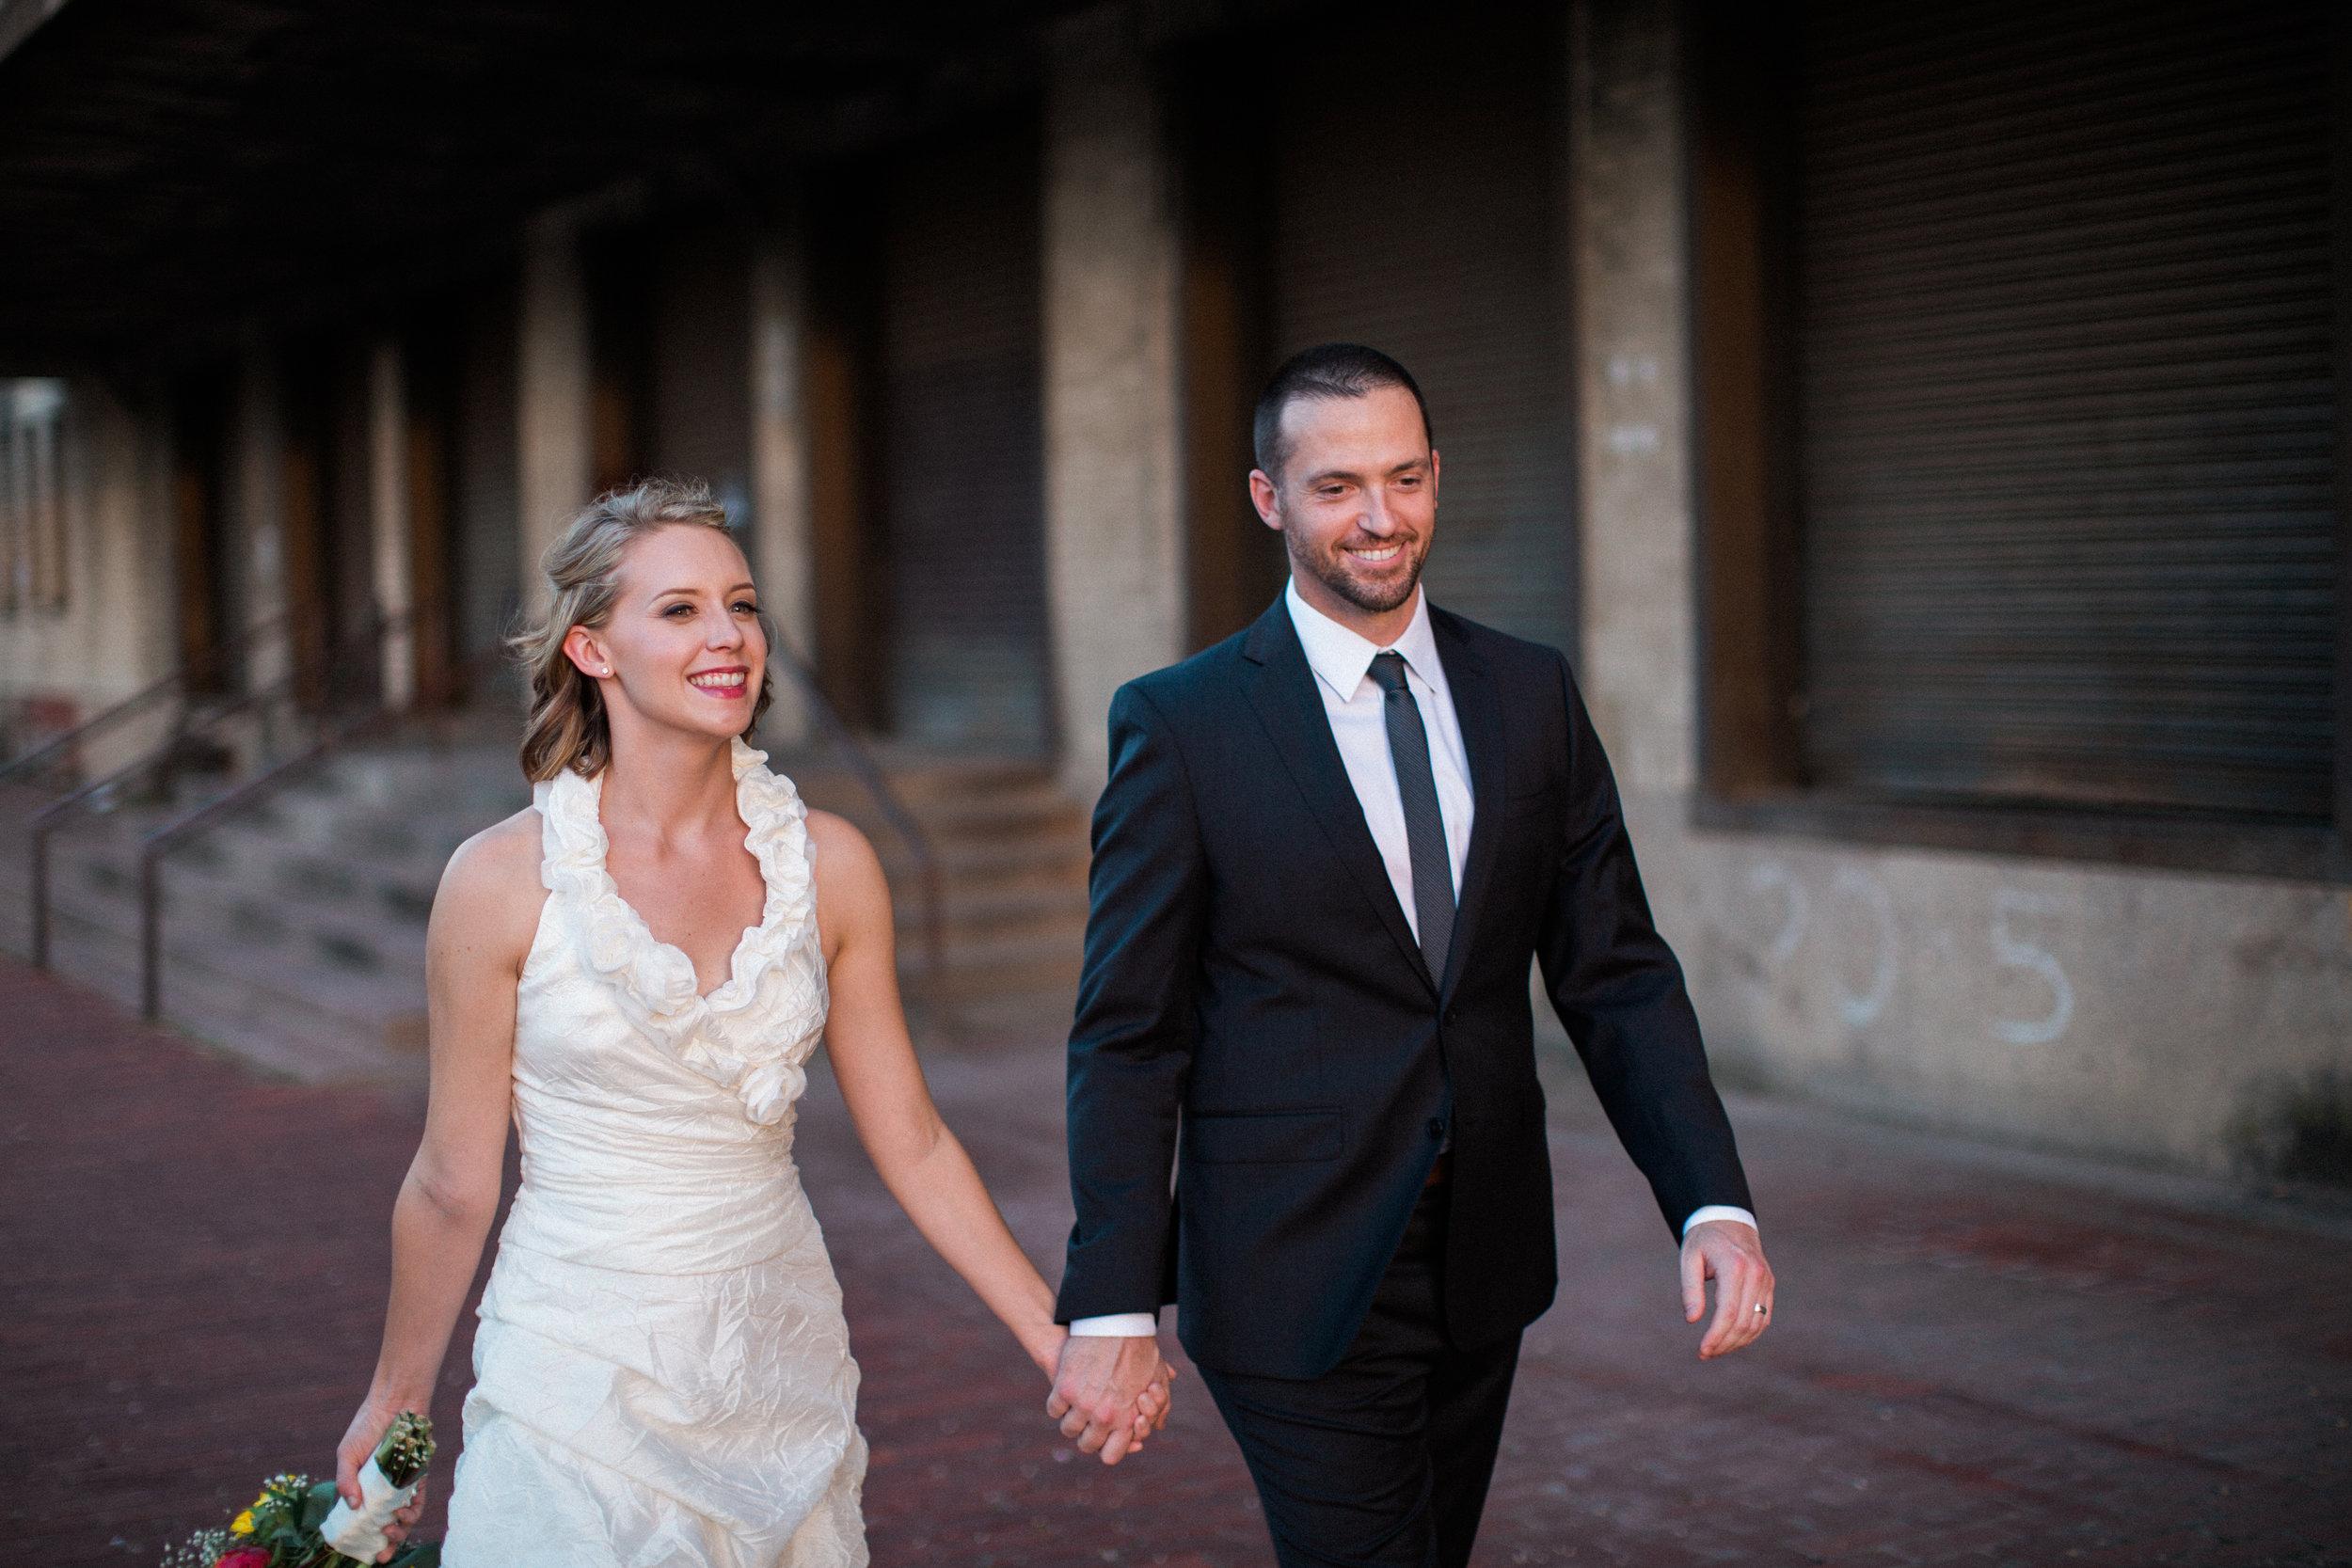 Fort Worth wedding photographer, bridal portraits, Dallas wedding photographer, Fort Worth photographer, Dallas photographer, bridal shoot, floral photographer